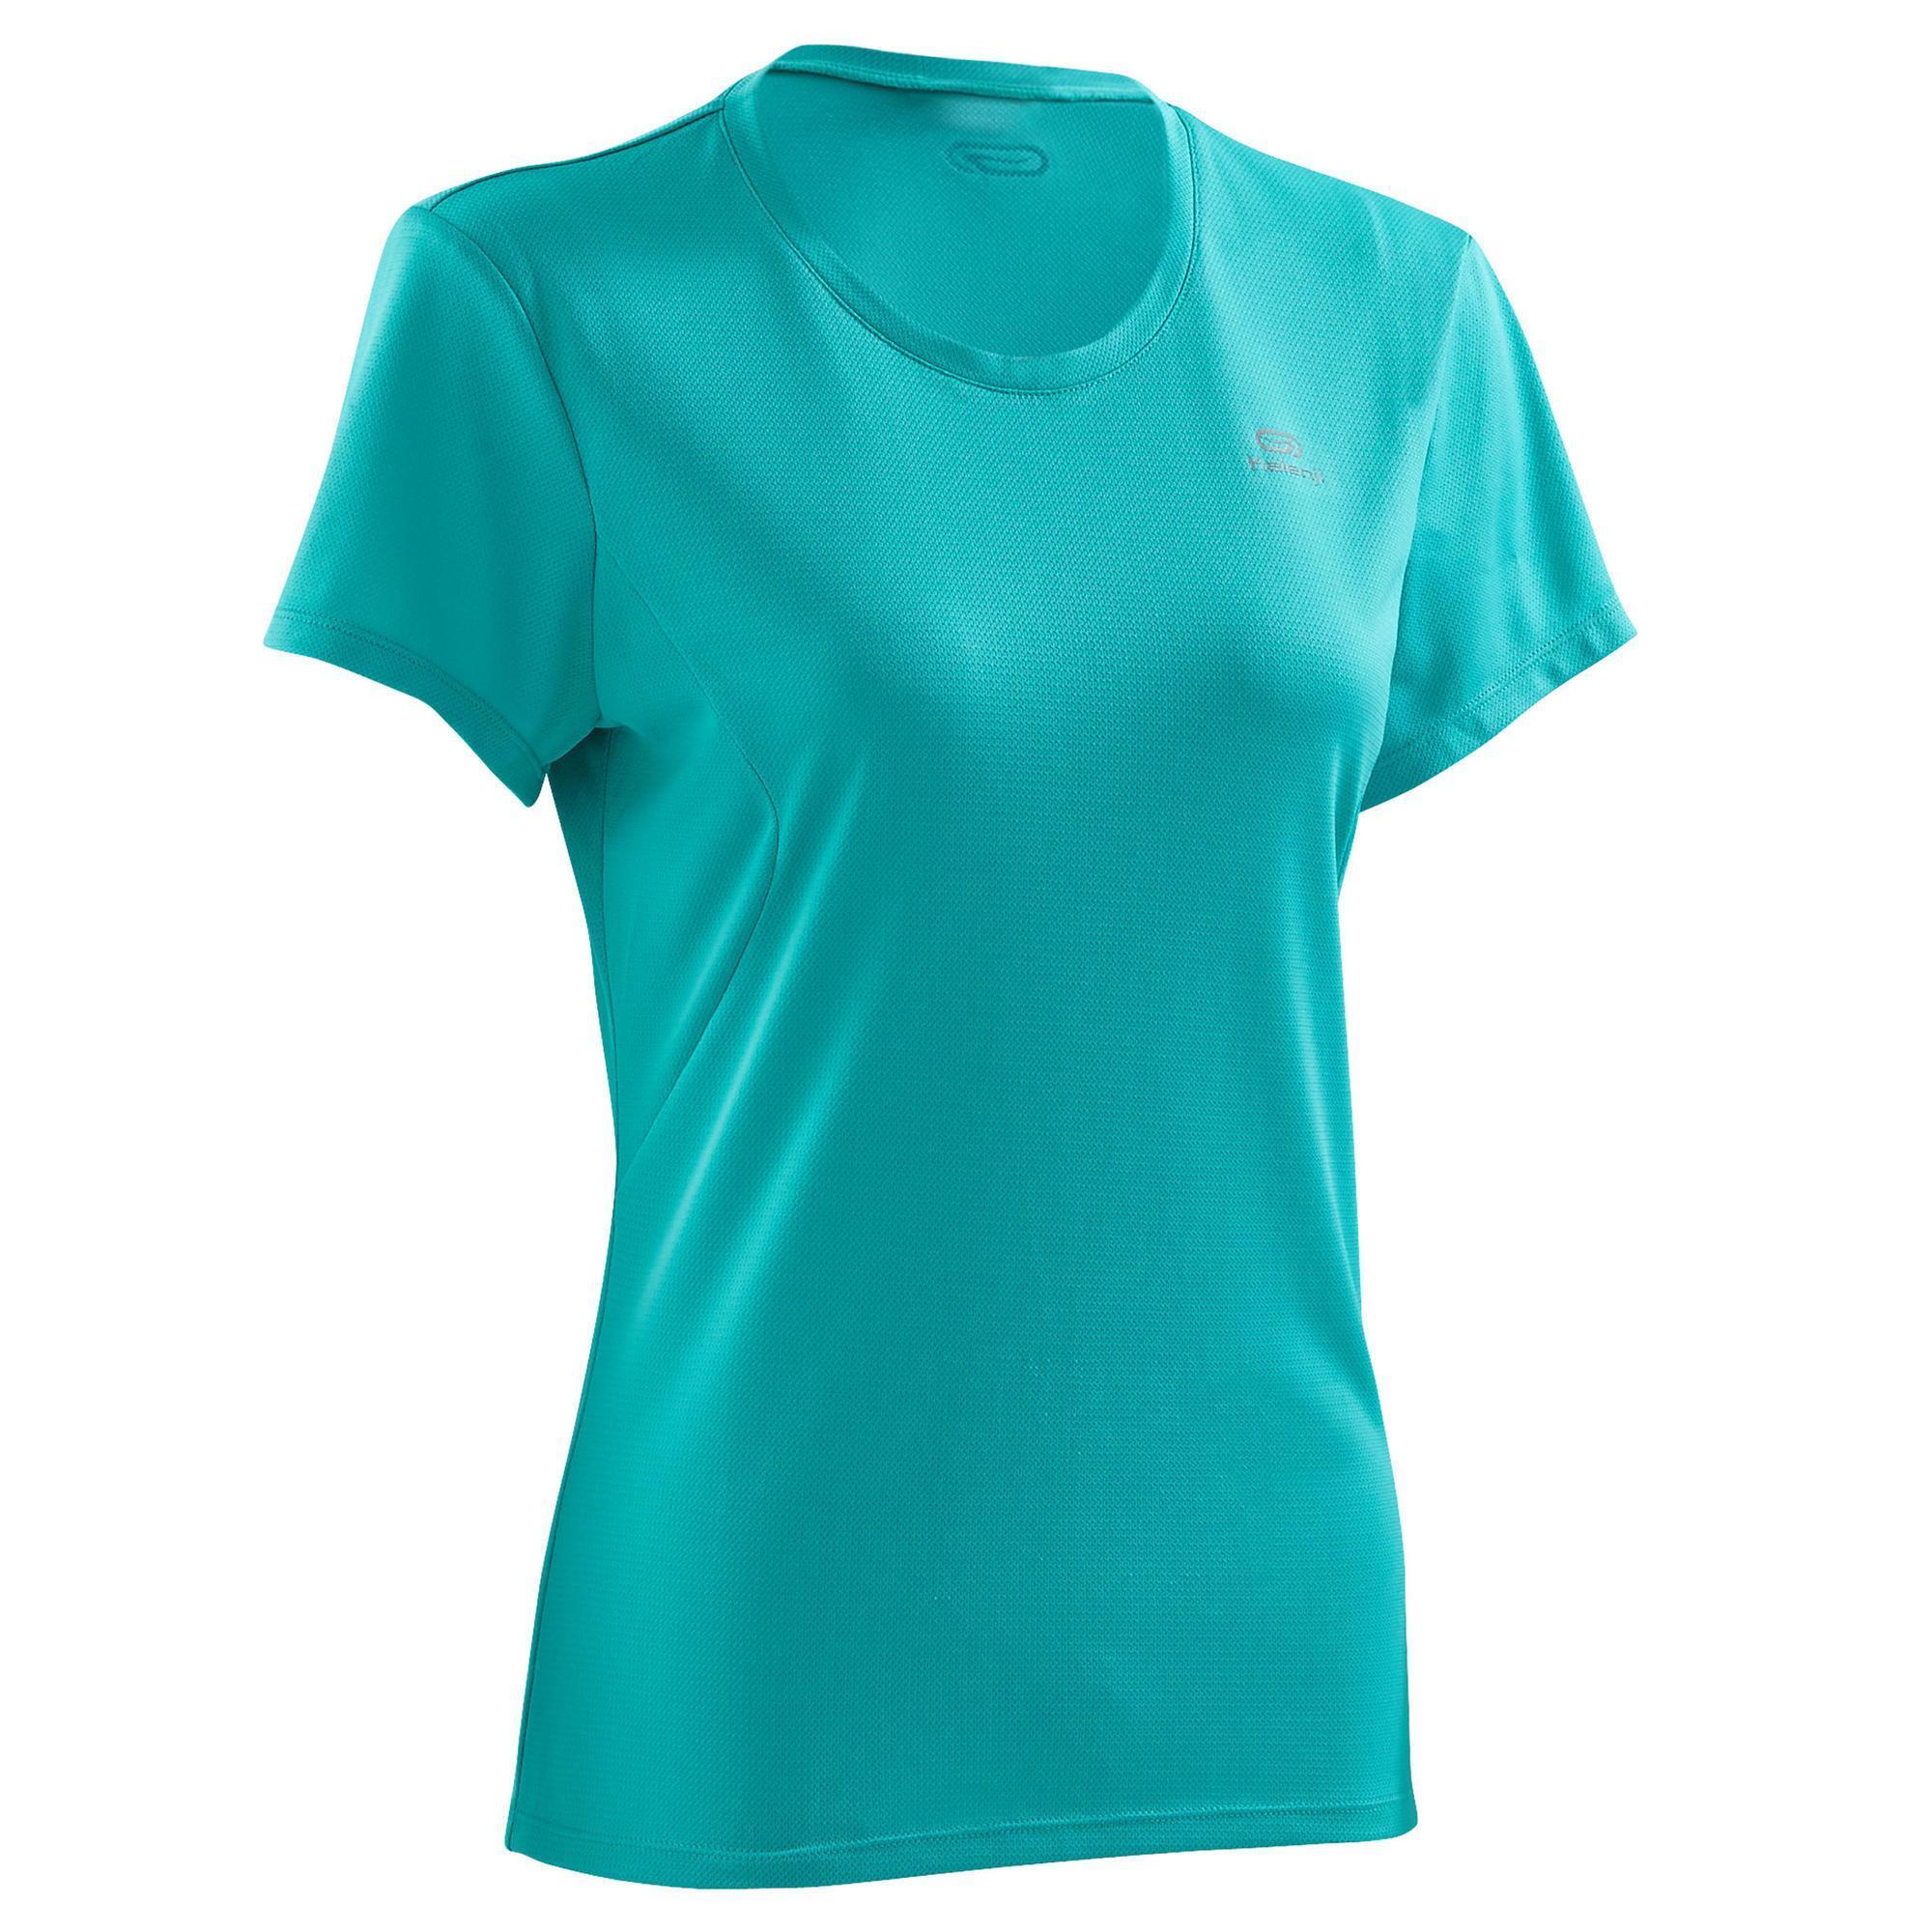 38c4ca2a558733 Kalenji Dames T shirt Run Dry voor hardlopen groen